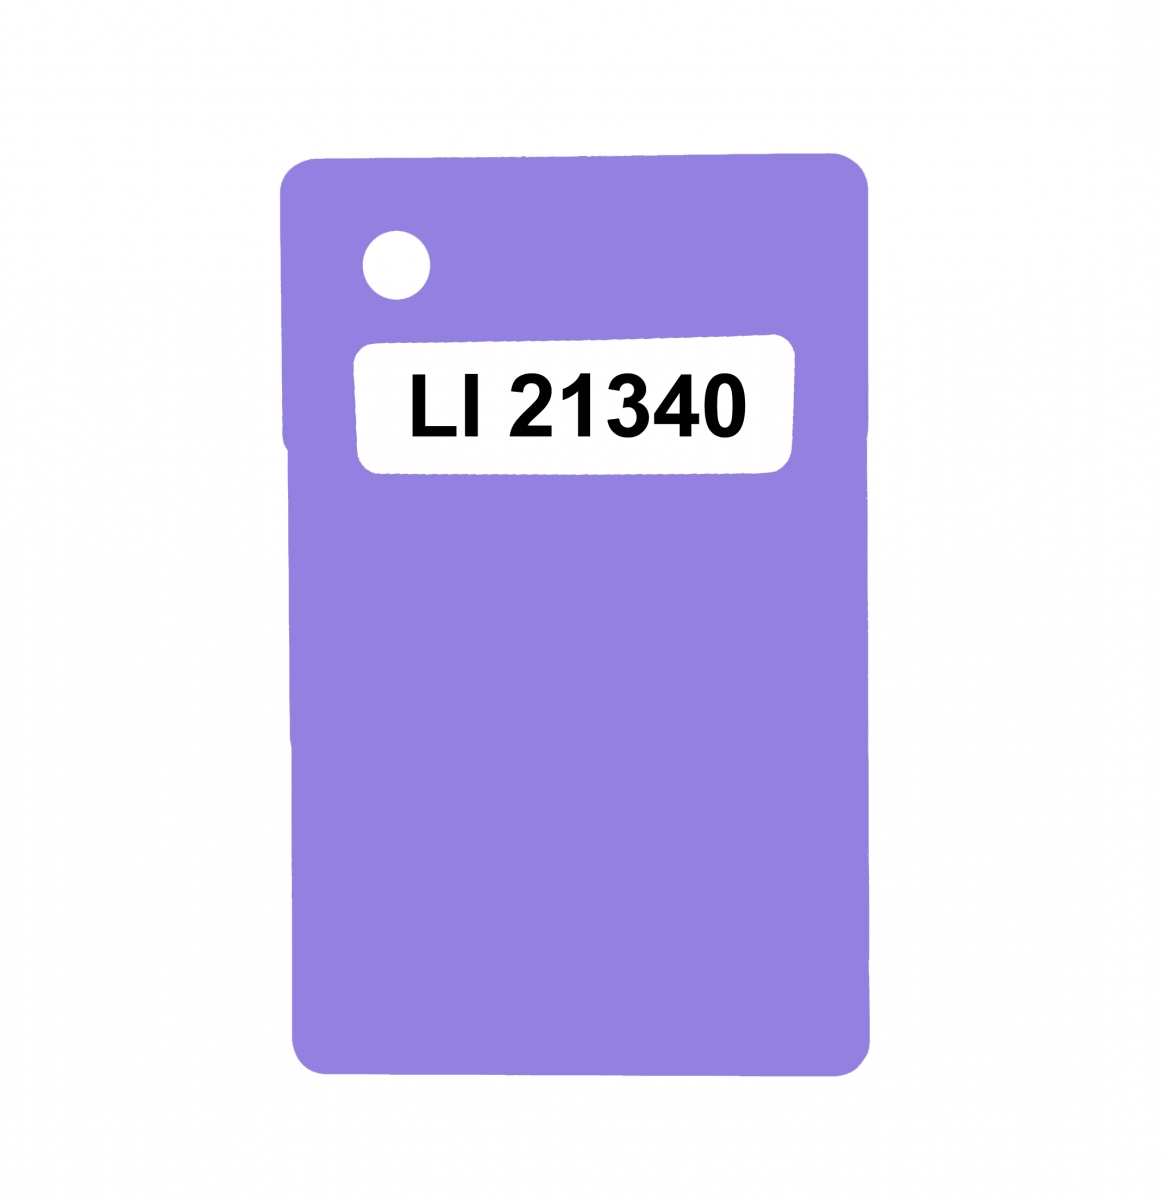 LI 21340 - Foto 1